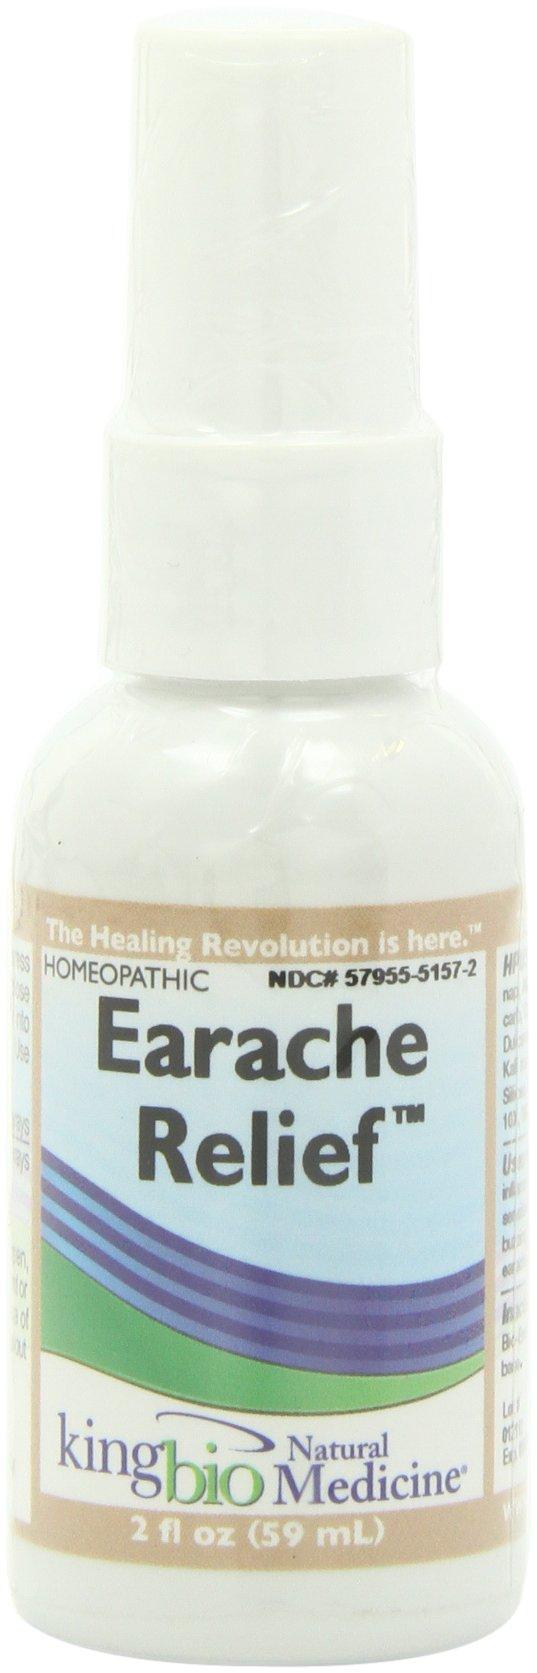 Dr. King's Natural Medicine Ear Relief Formula, 2 Fluid Ounce